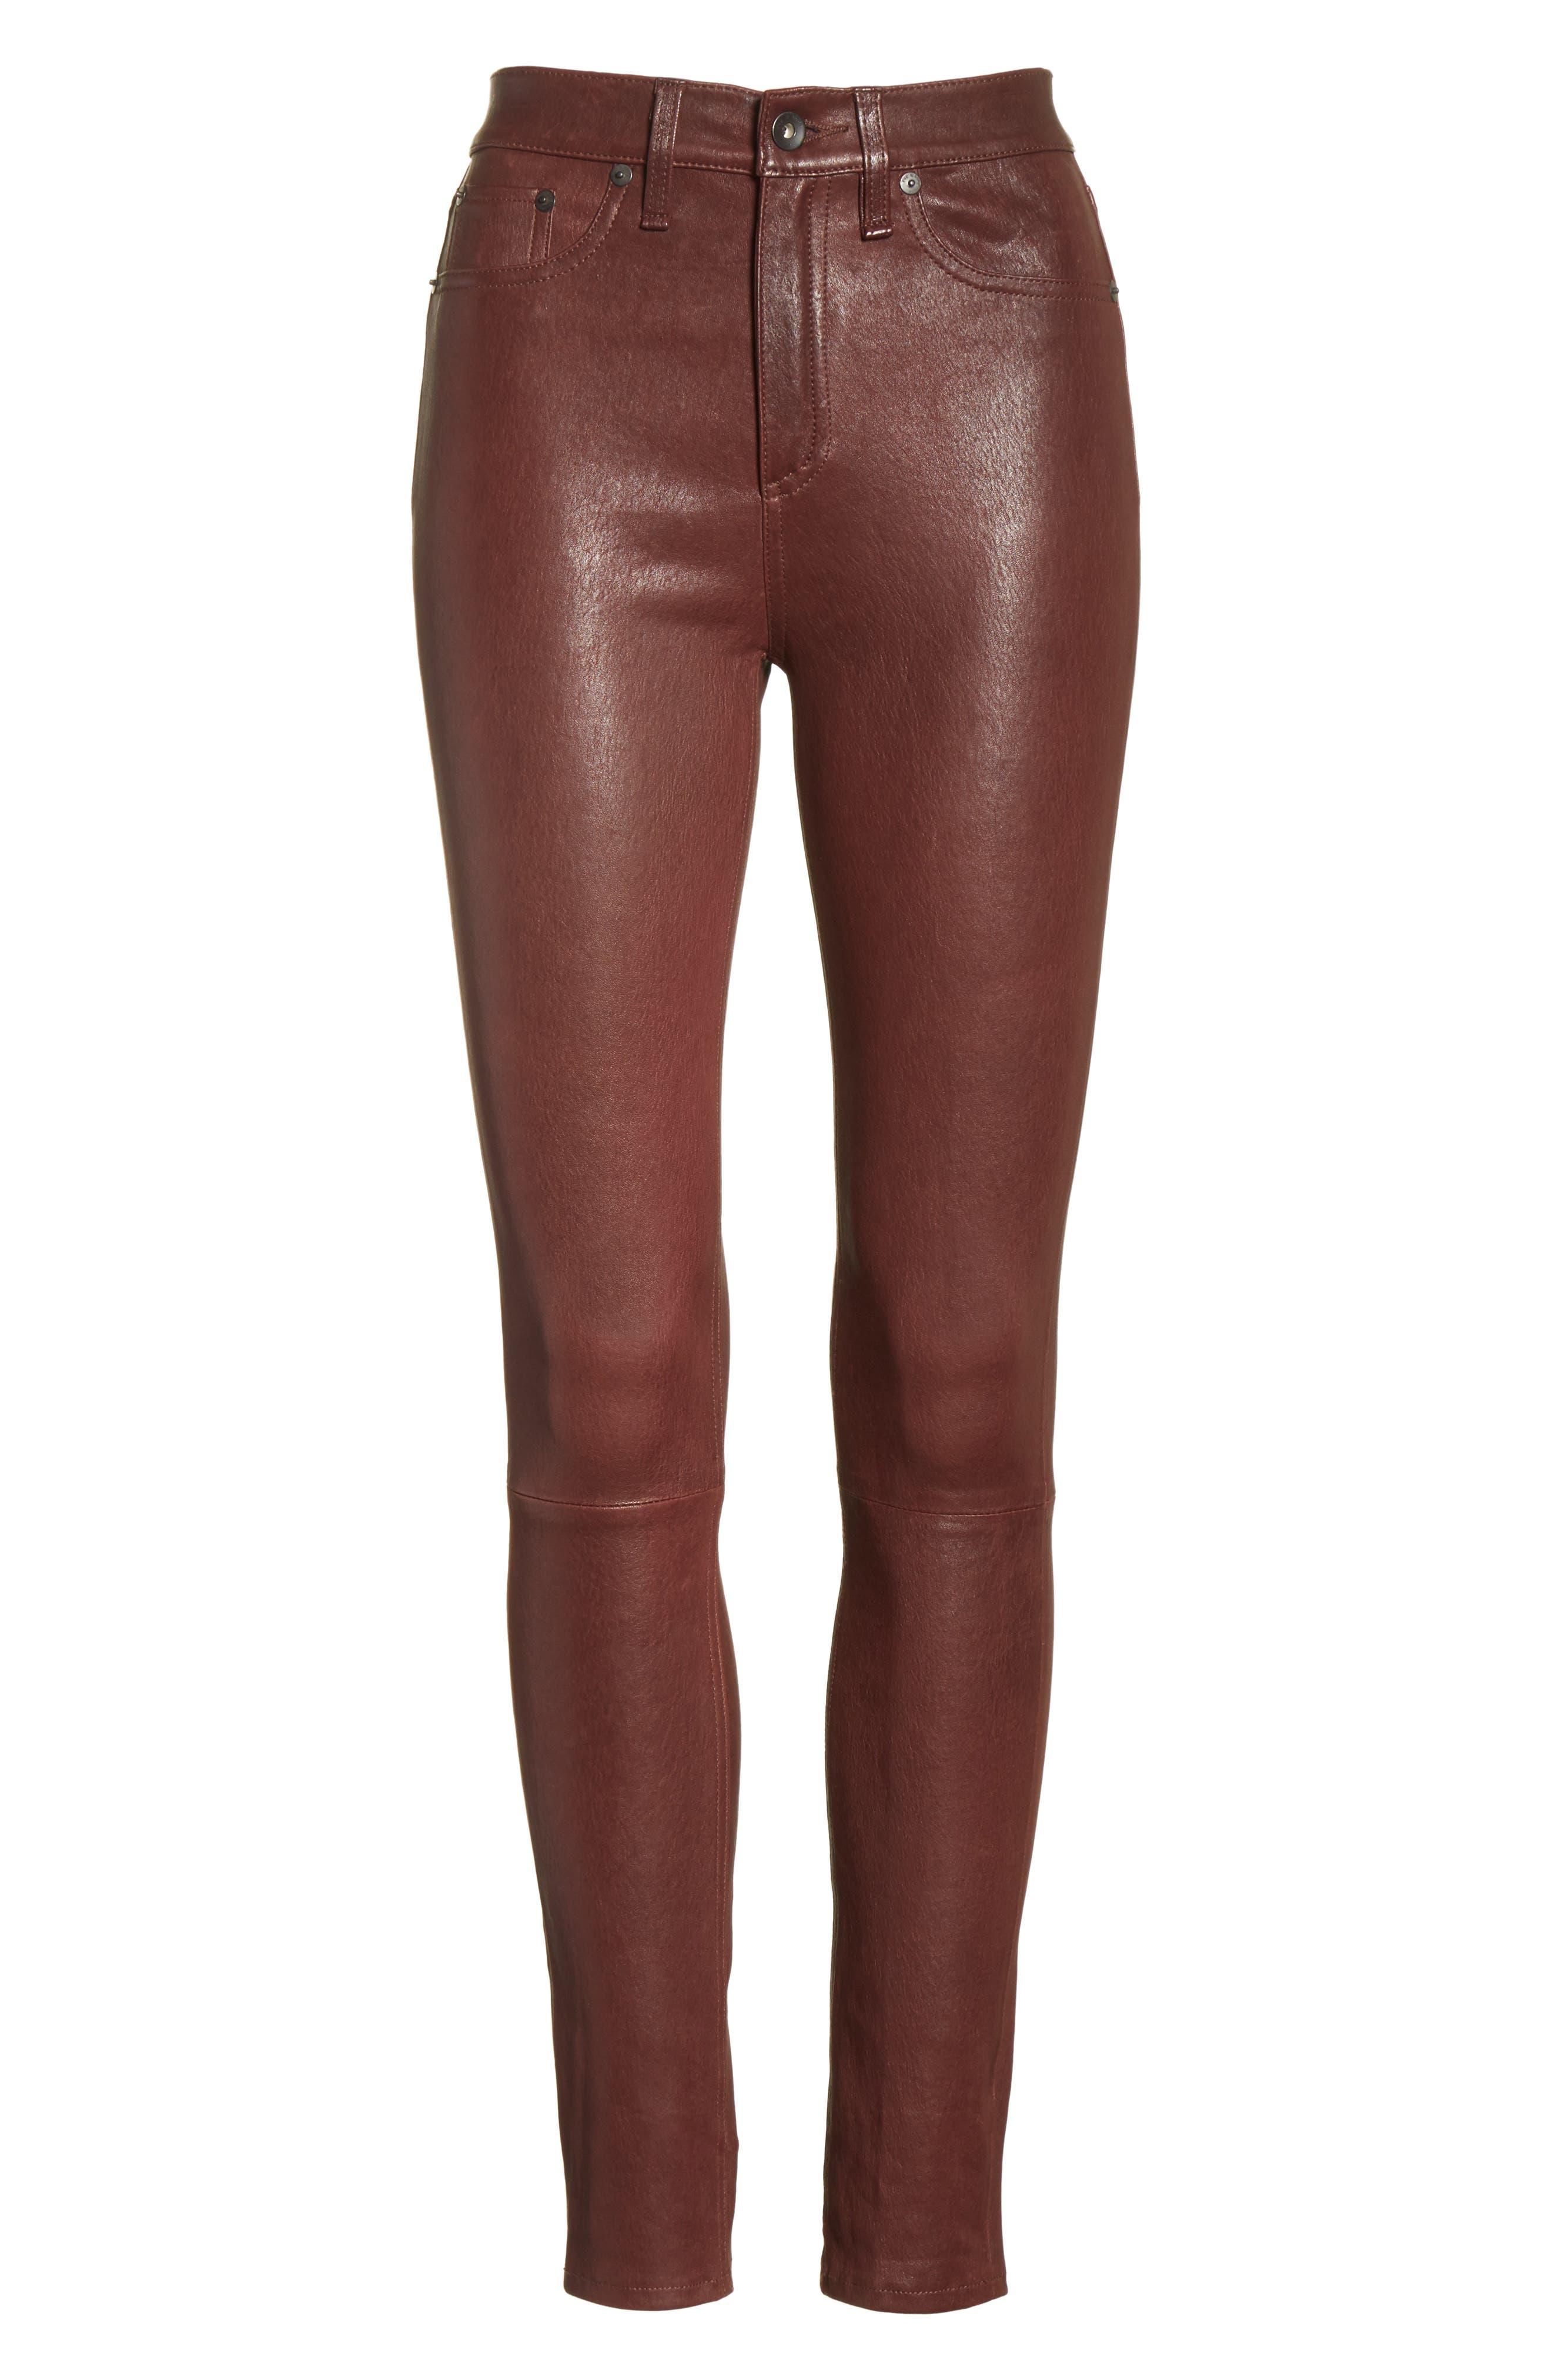 Lambskin Leather Pants,                             Alternate thumbnail 6, color,                             230